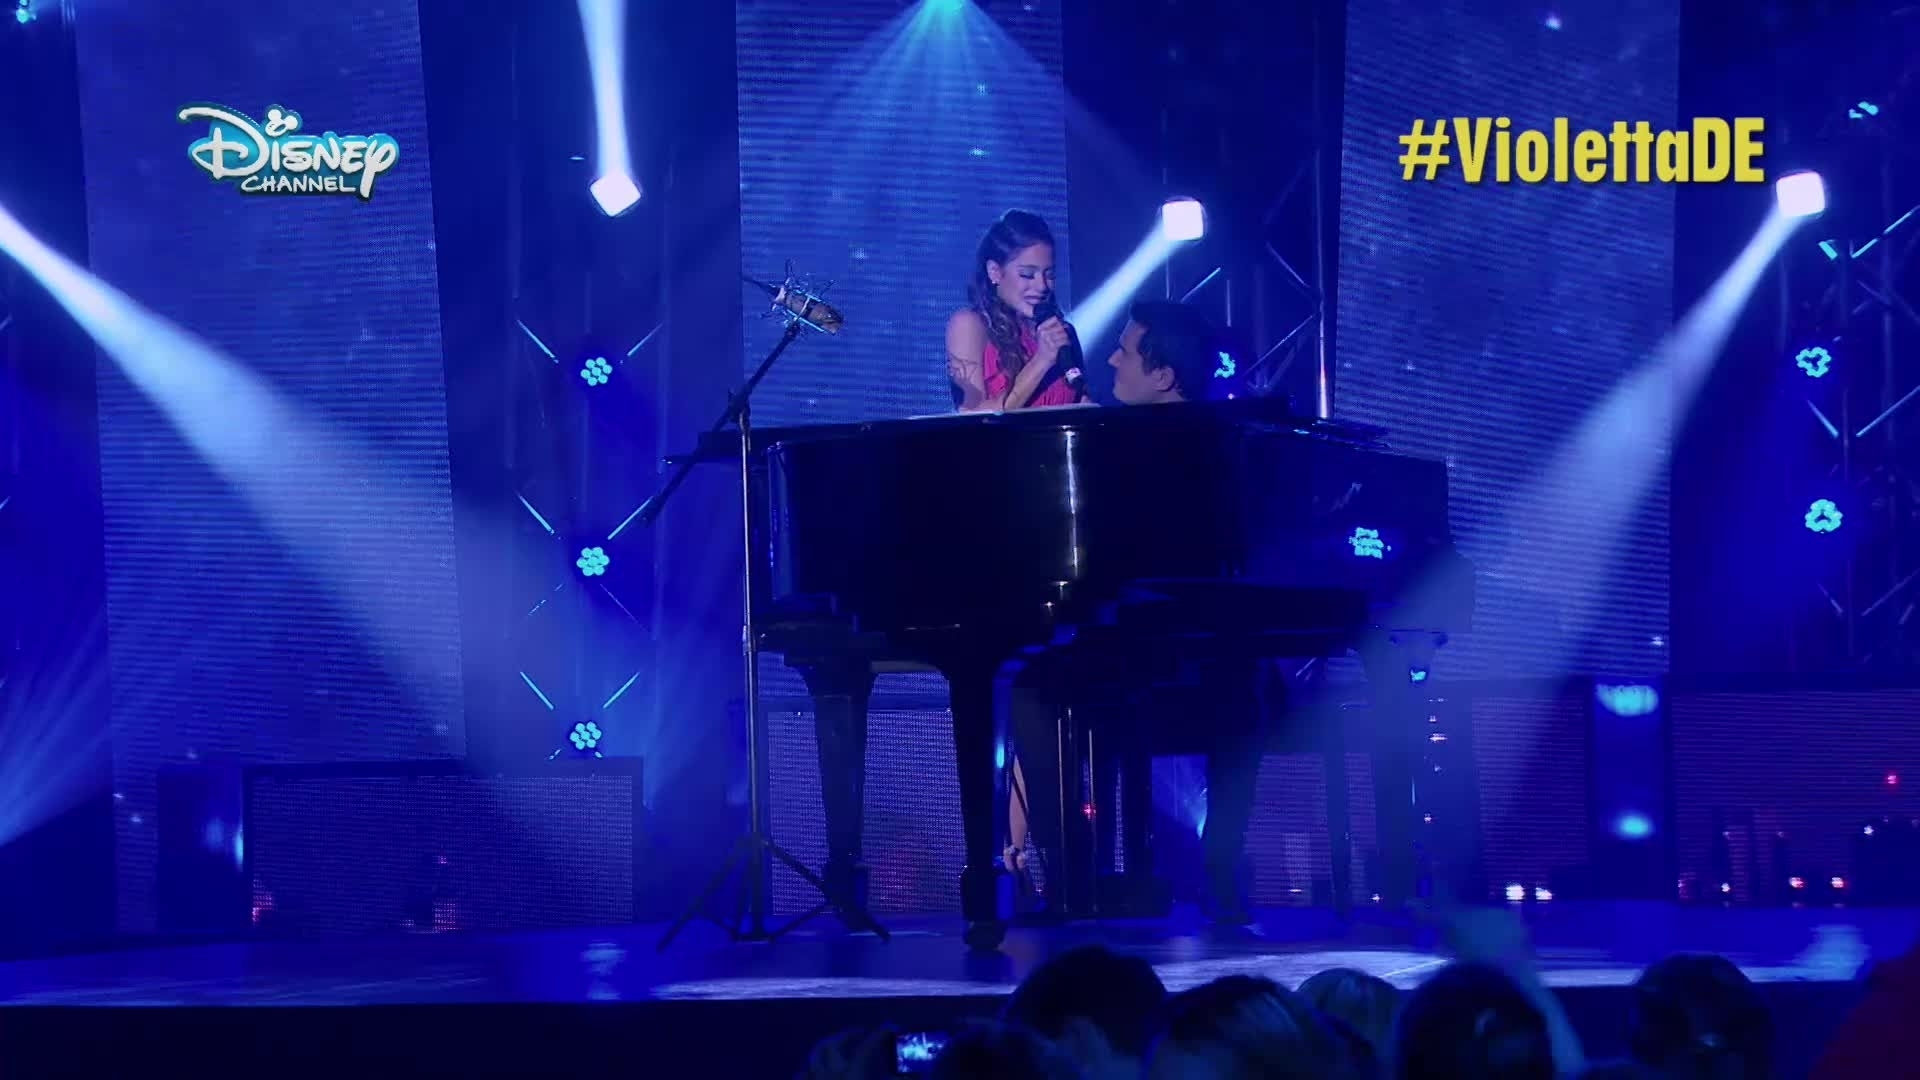 Violetta Song - Soy mi mejor momento